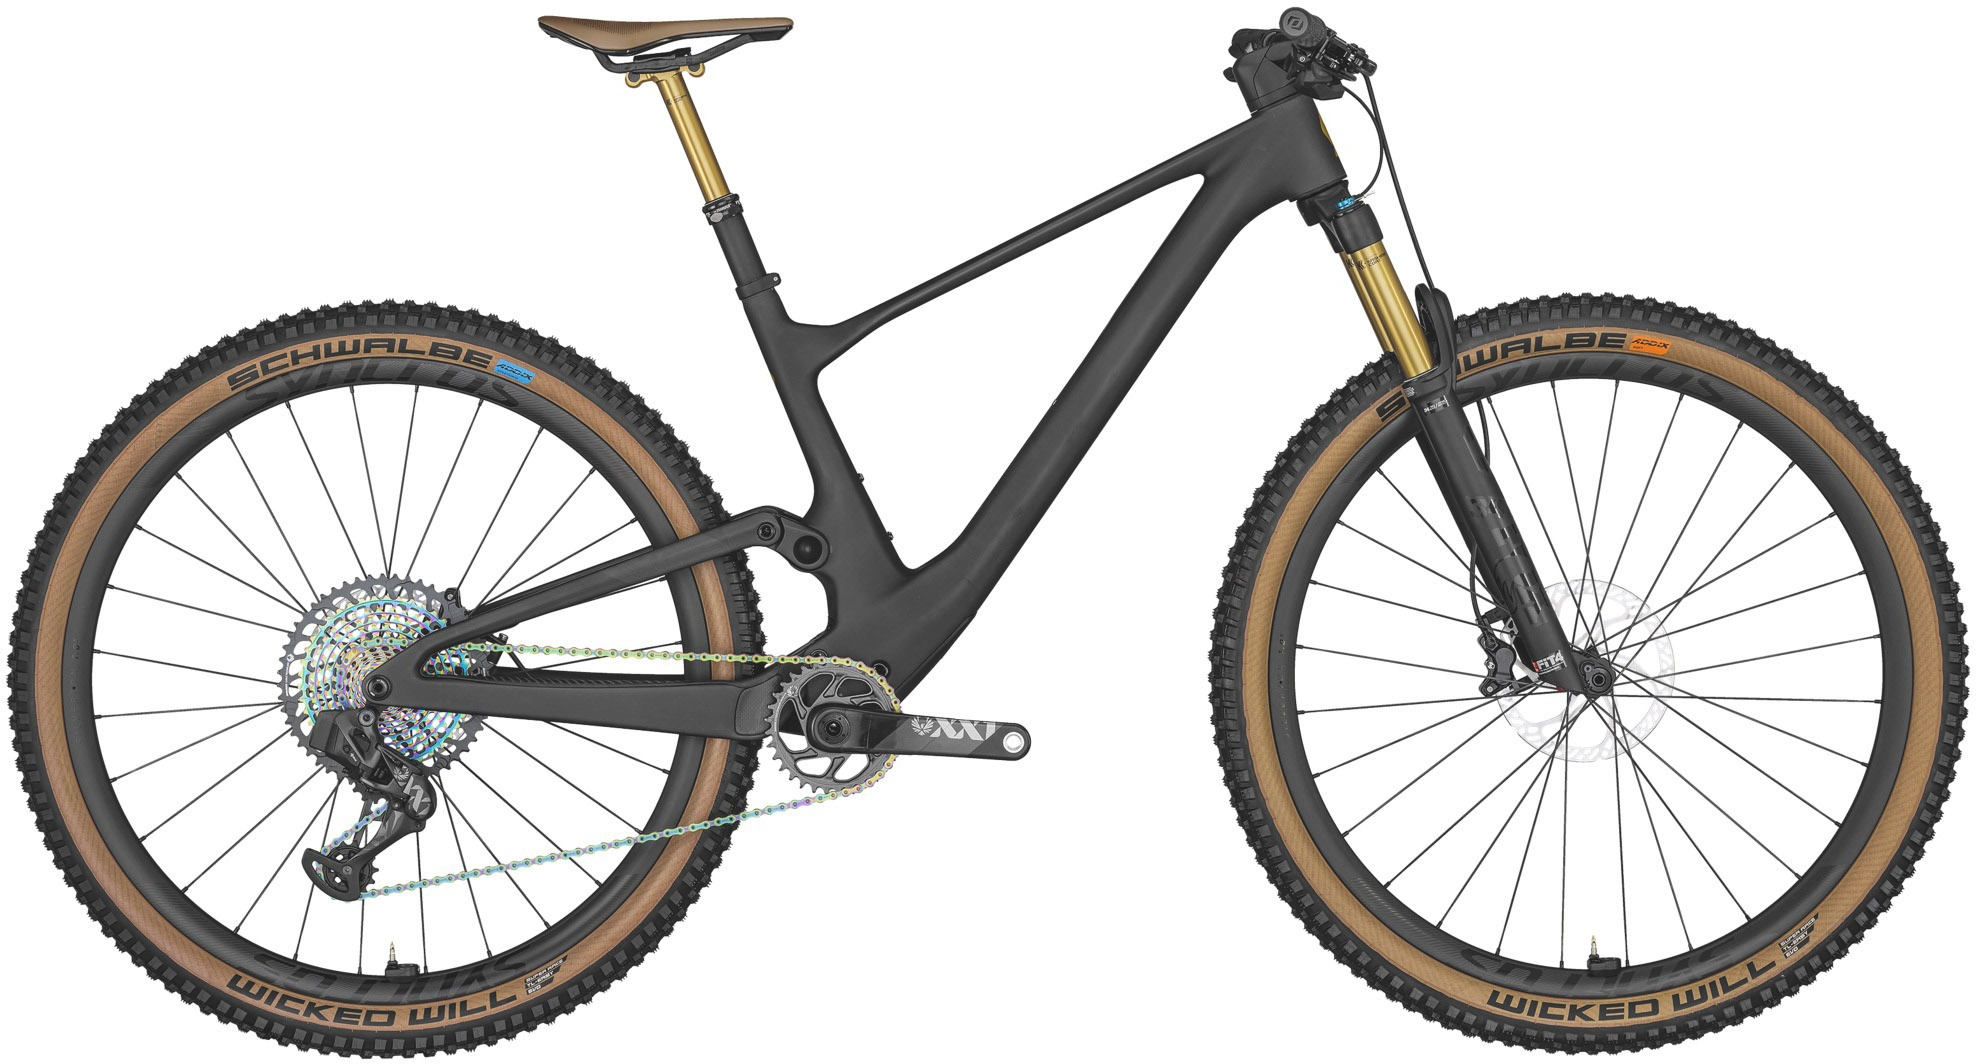 Scott Spark 900 Ultimate EVO AXS 2022